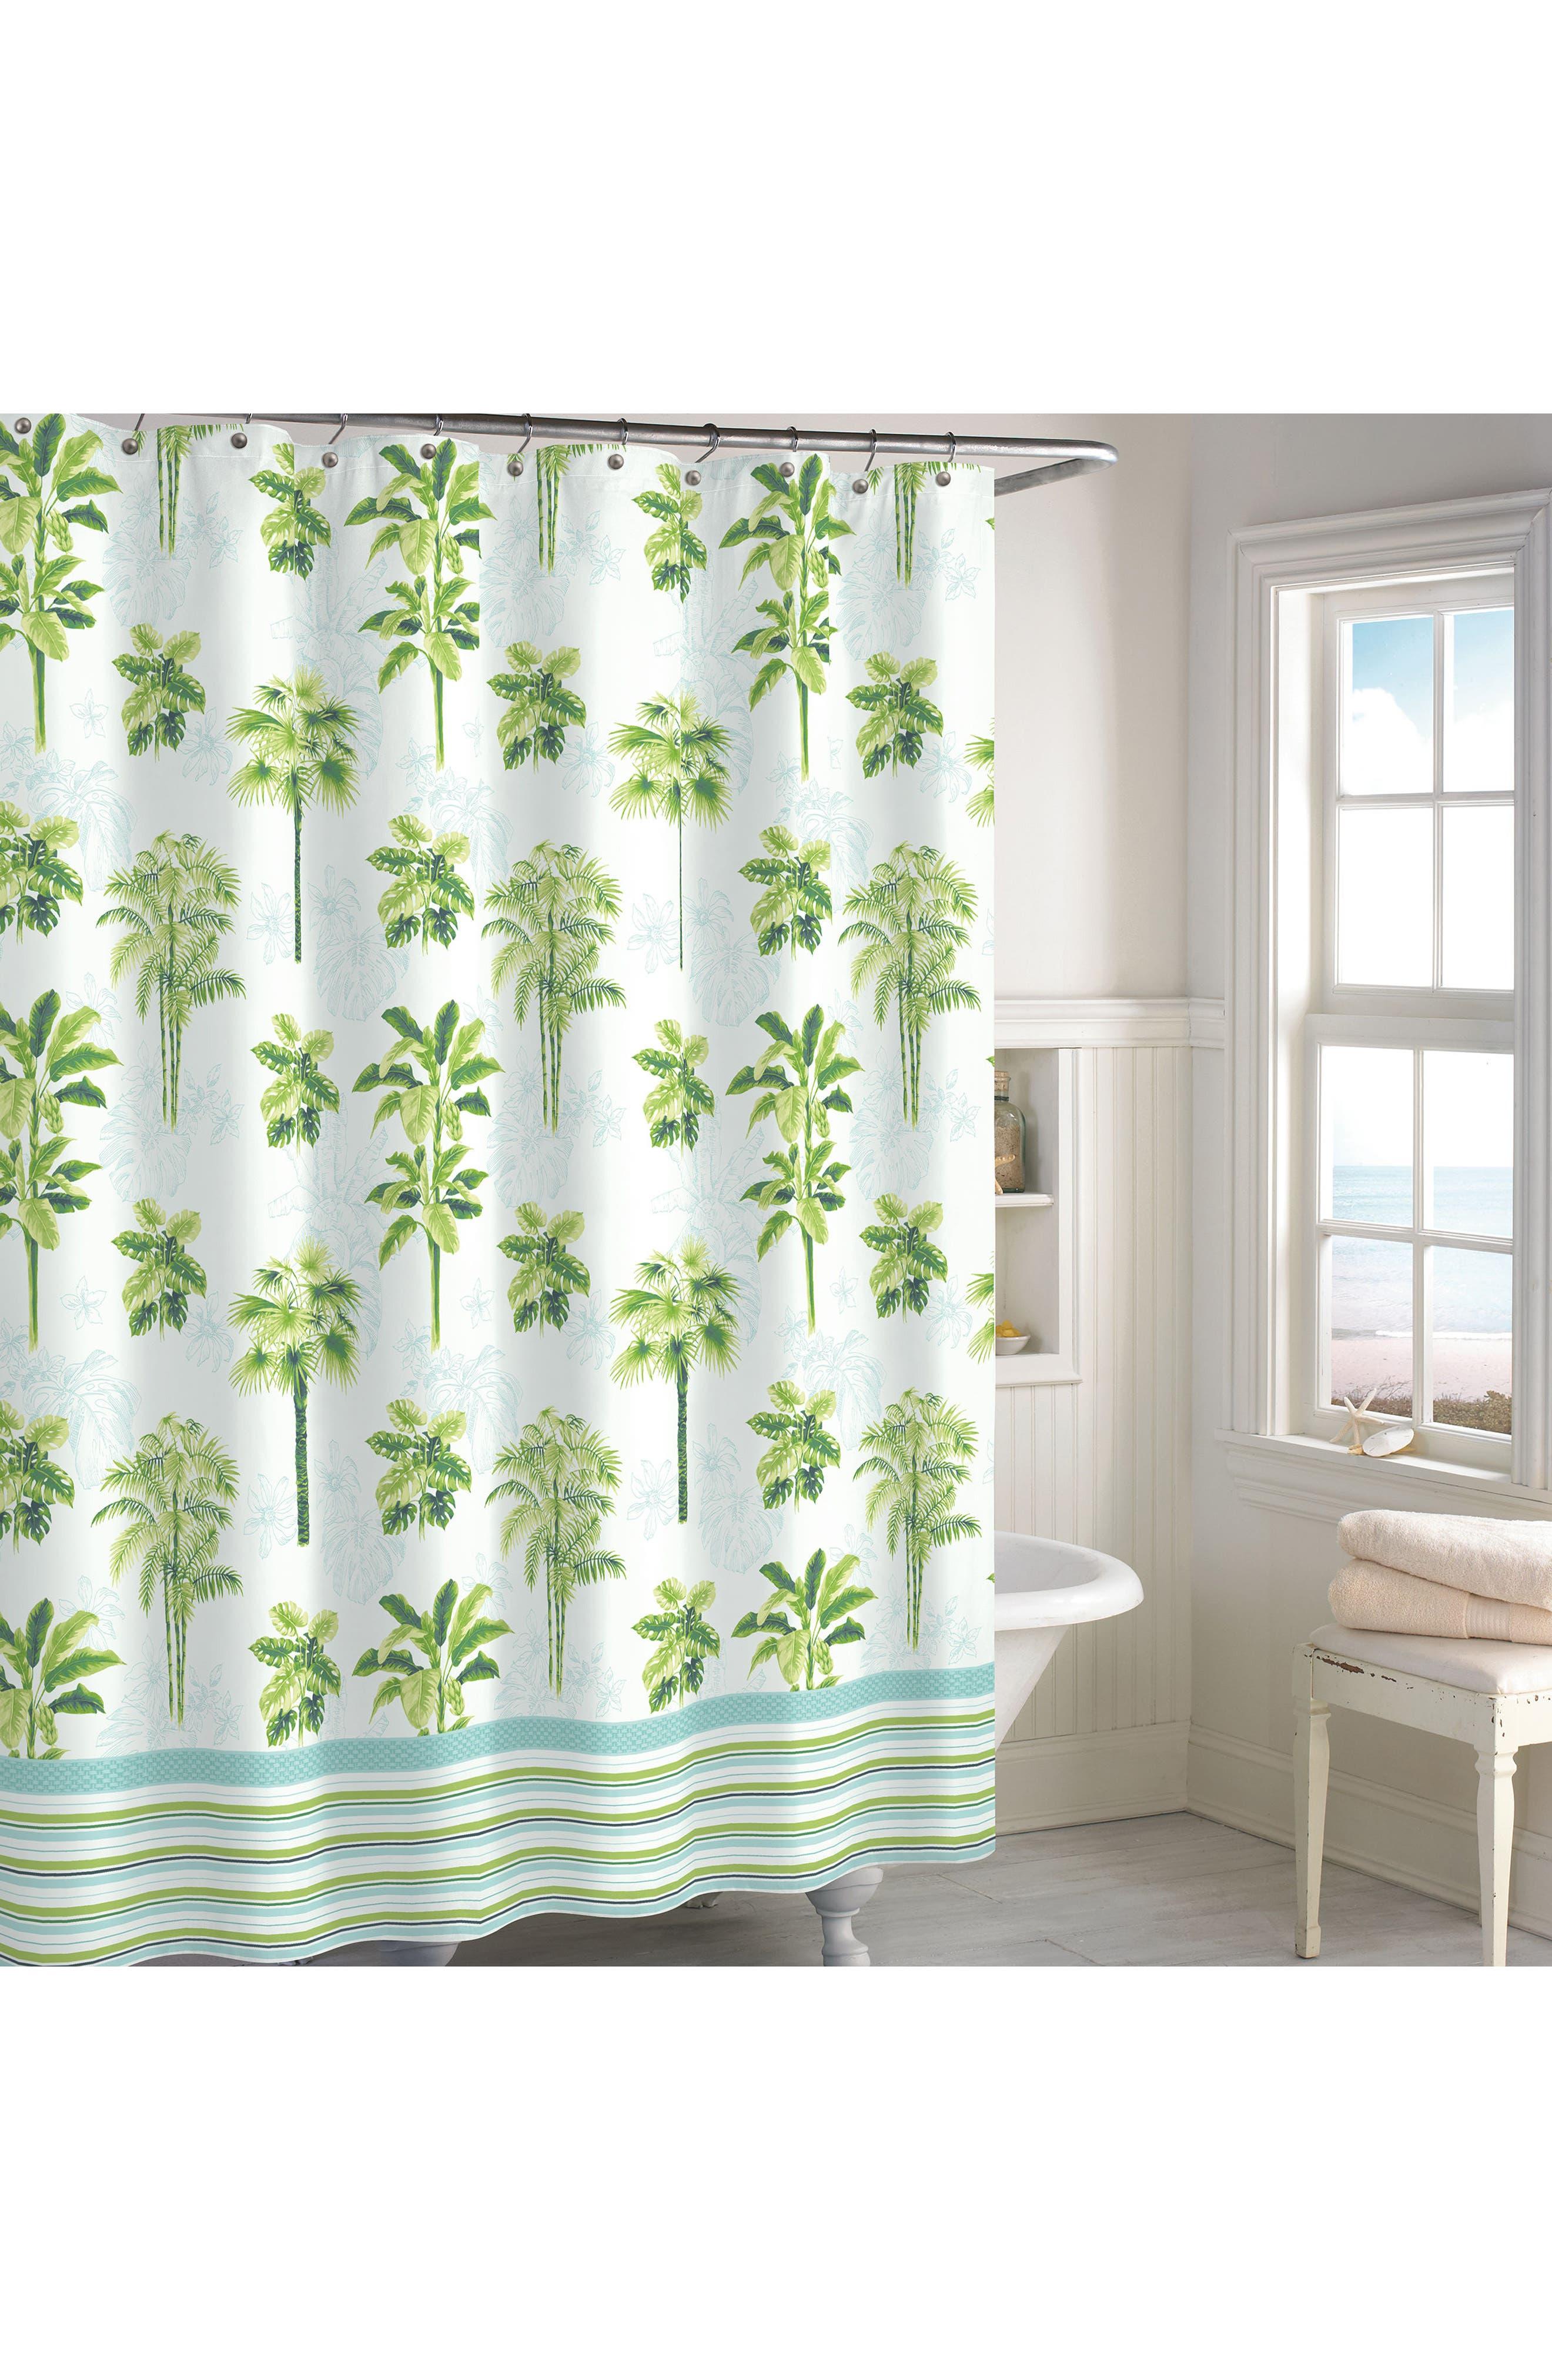 Tropical Palm Shower Curtain,                             Main thumbnail 1, color,                             300